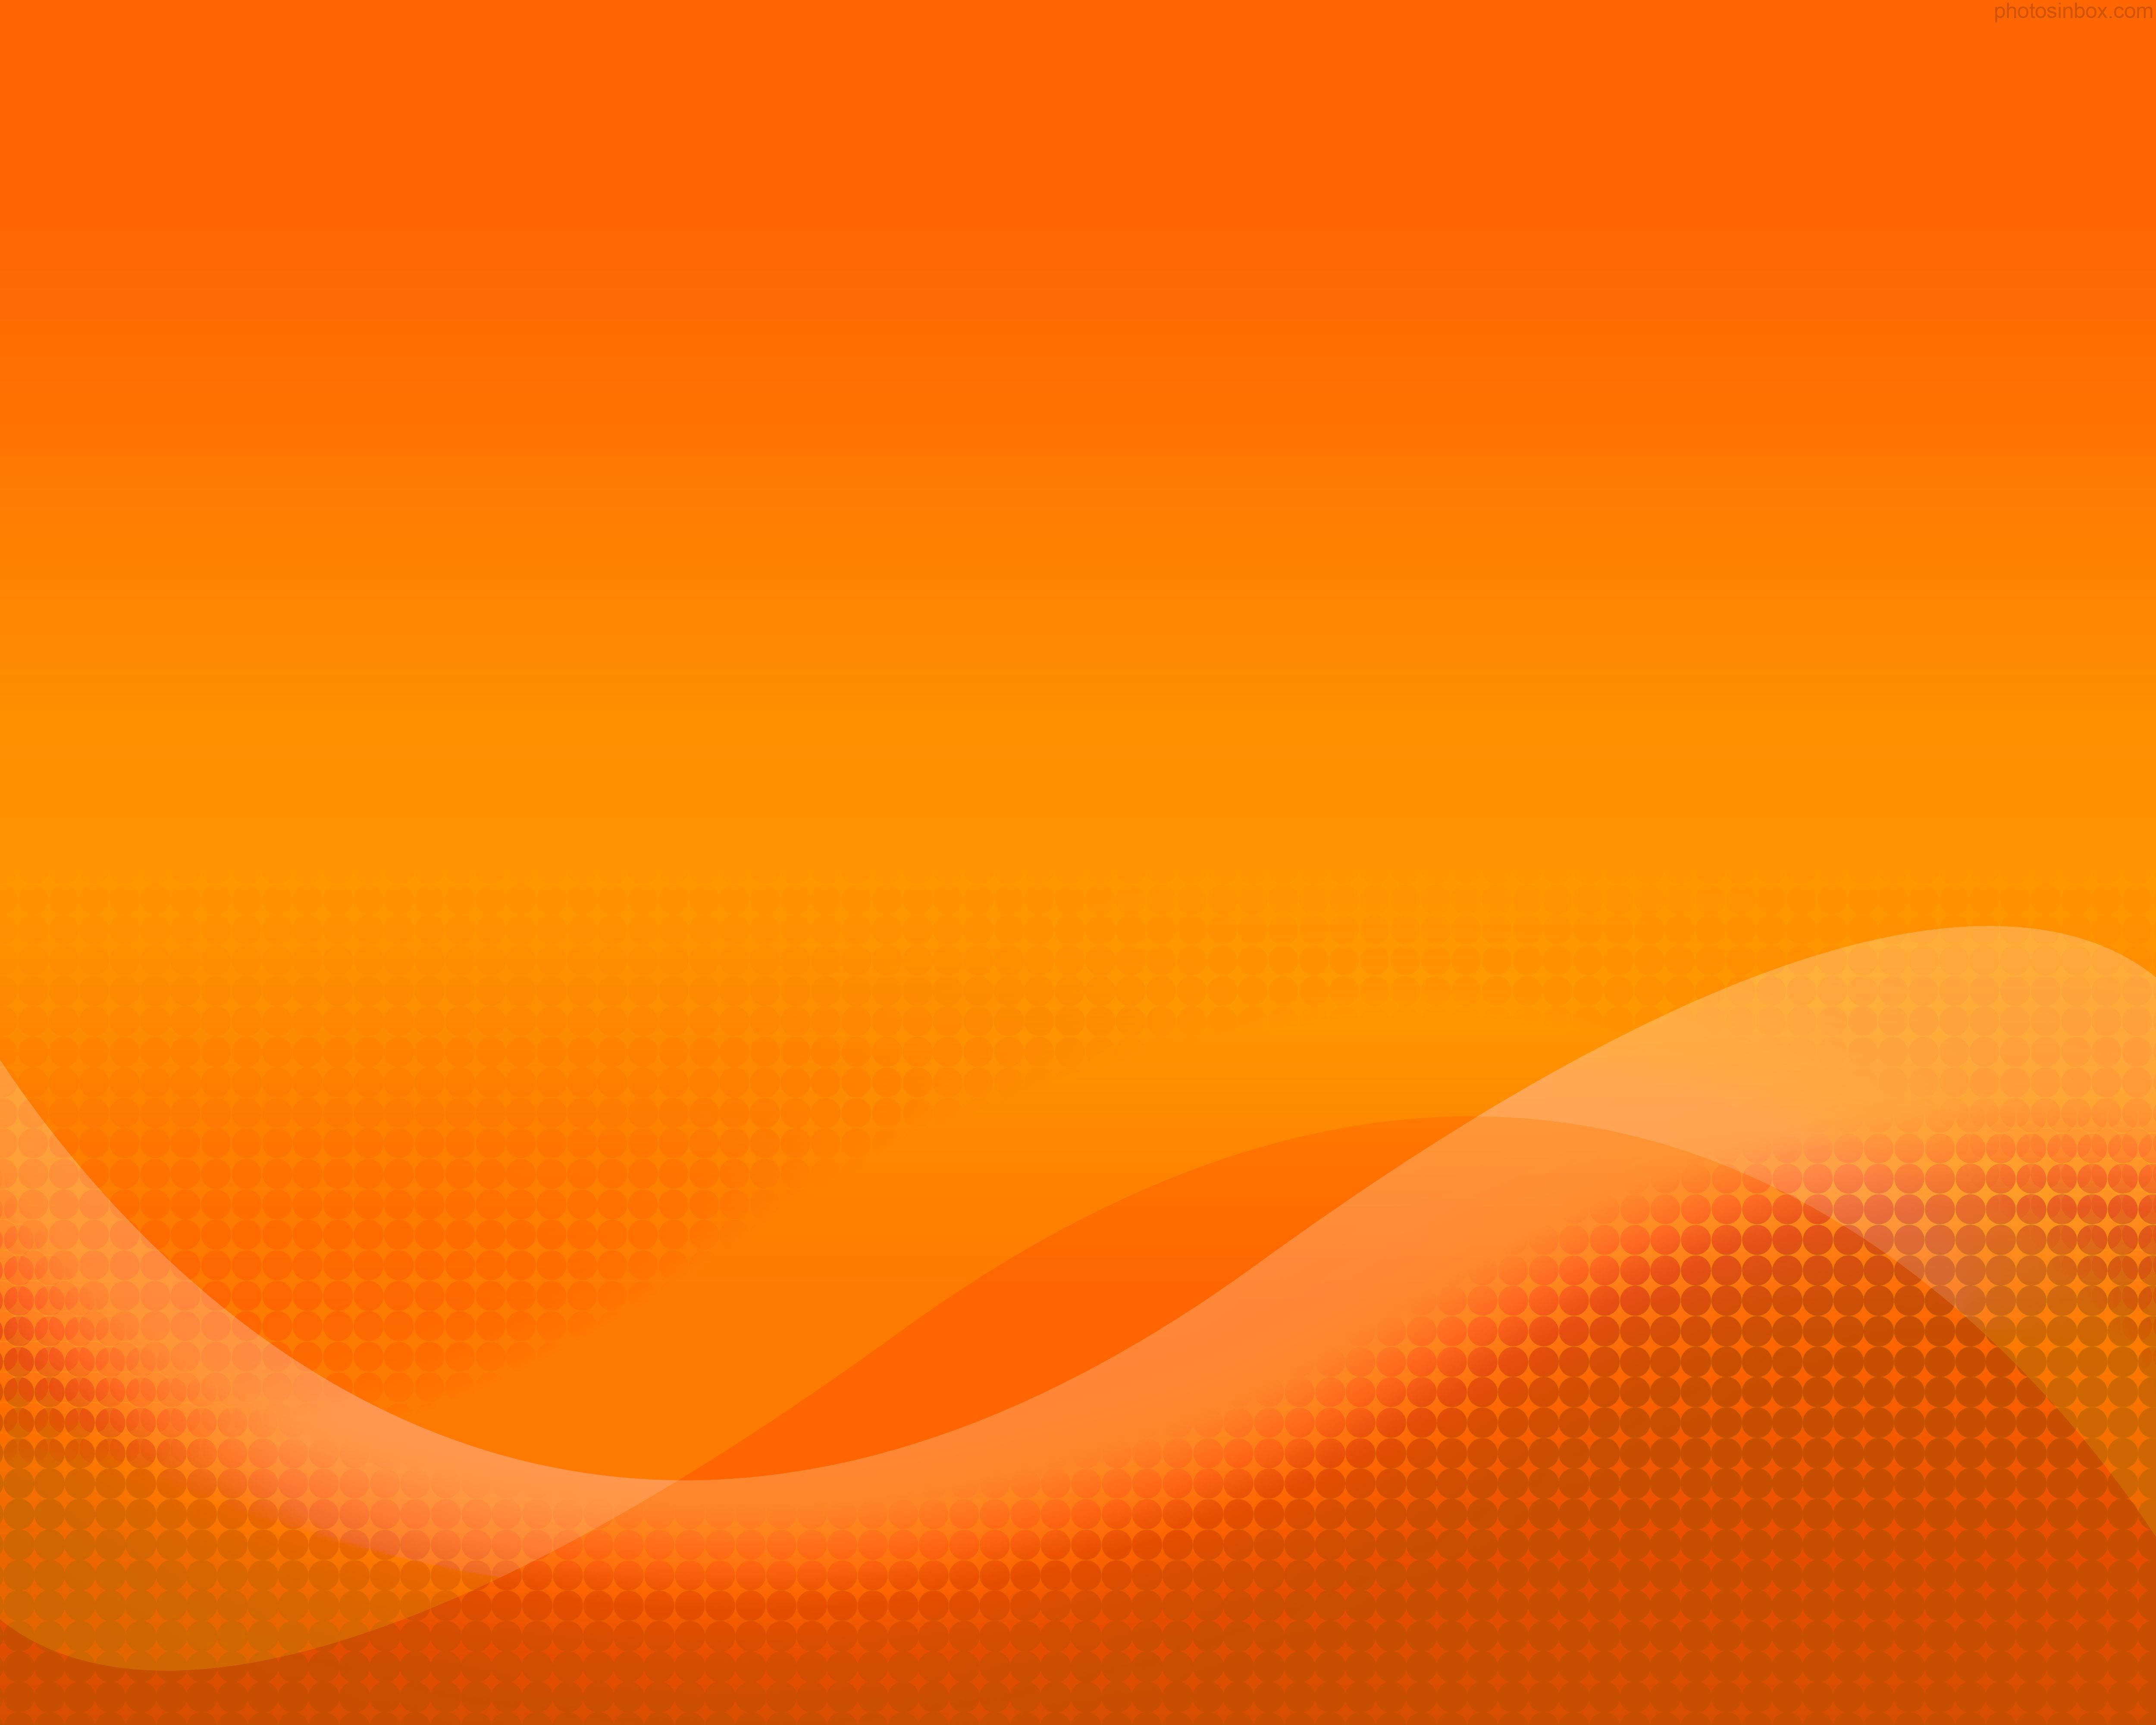 orange-waves2